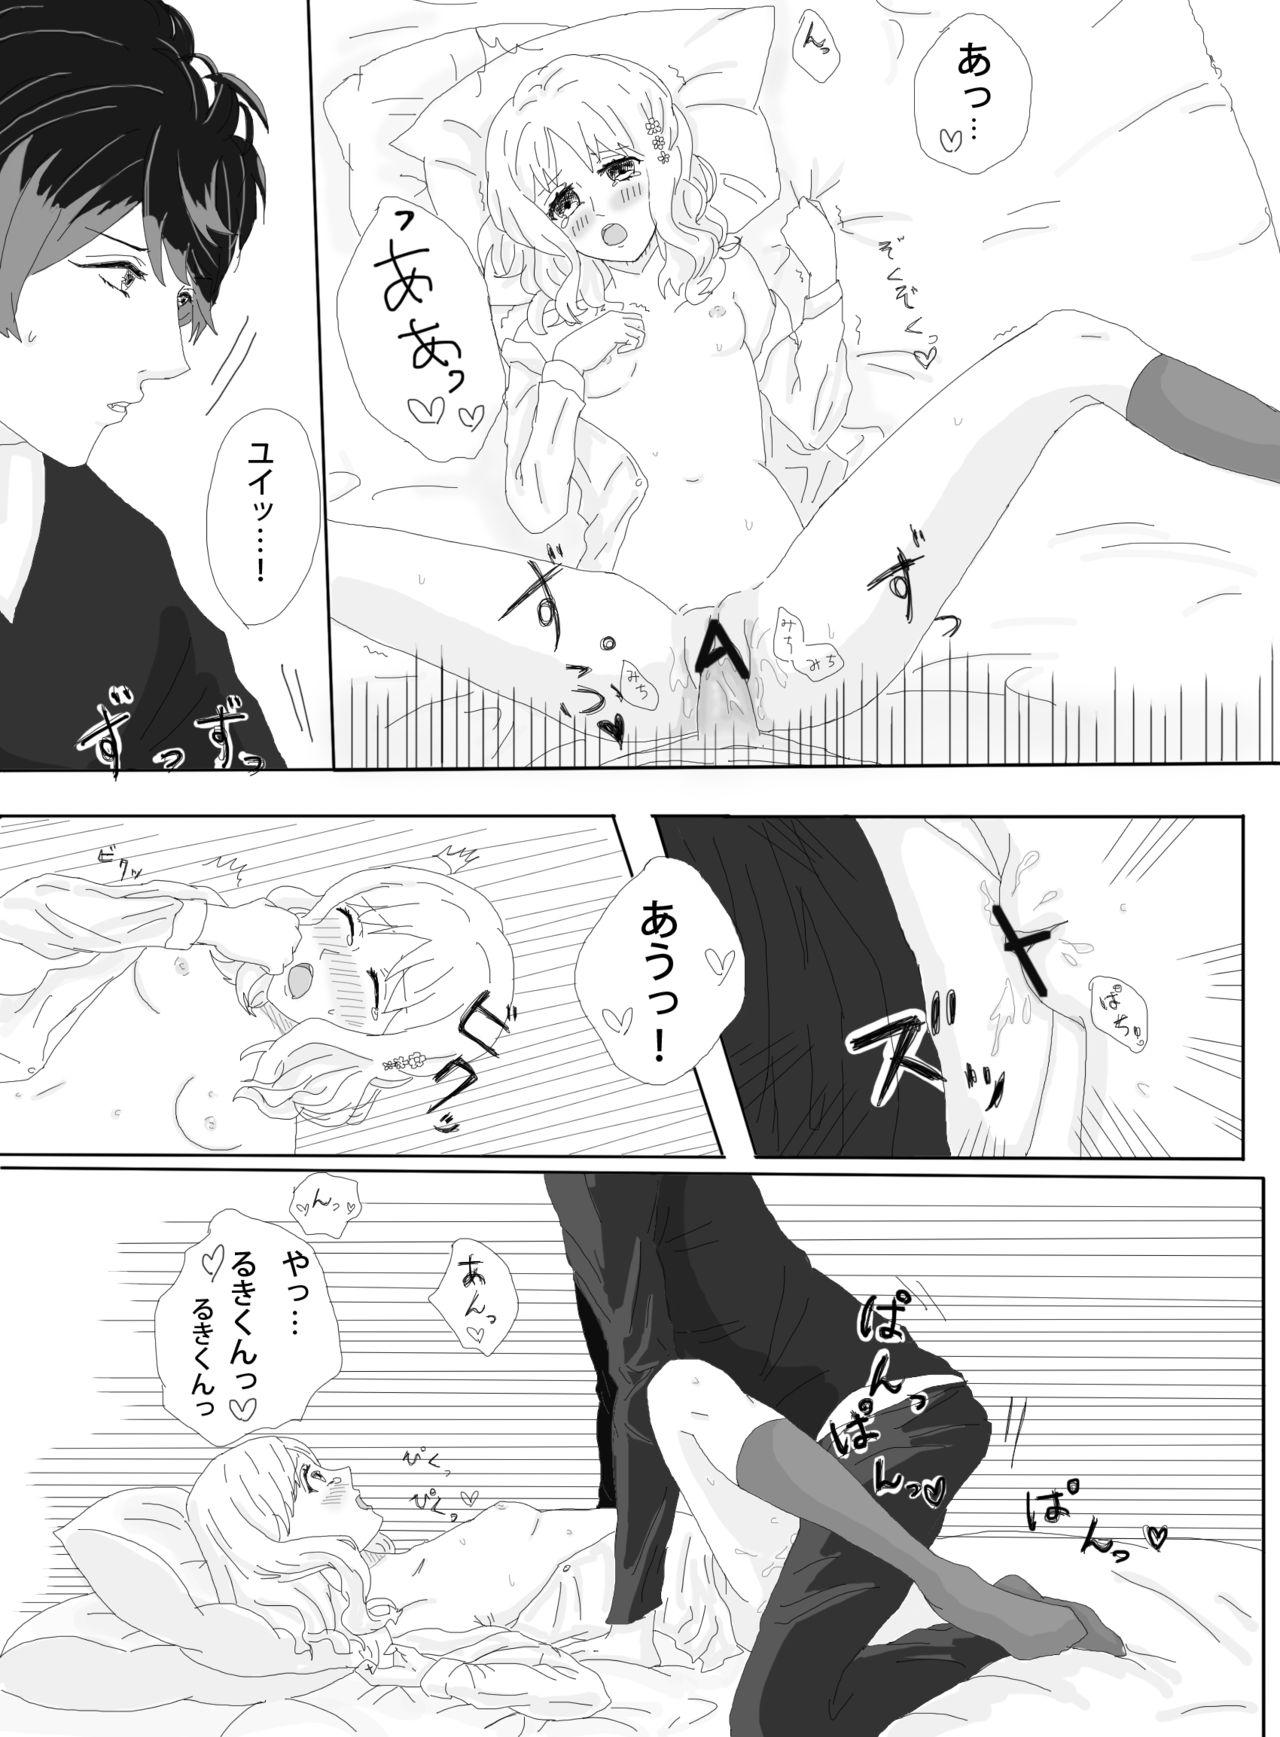 Rukiyui-chan no wo Midarana Manga 1